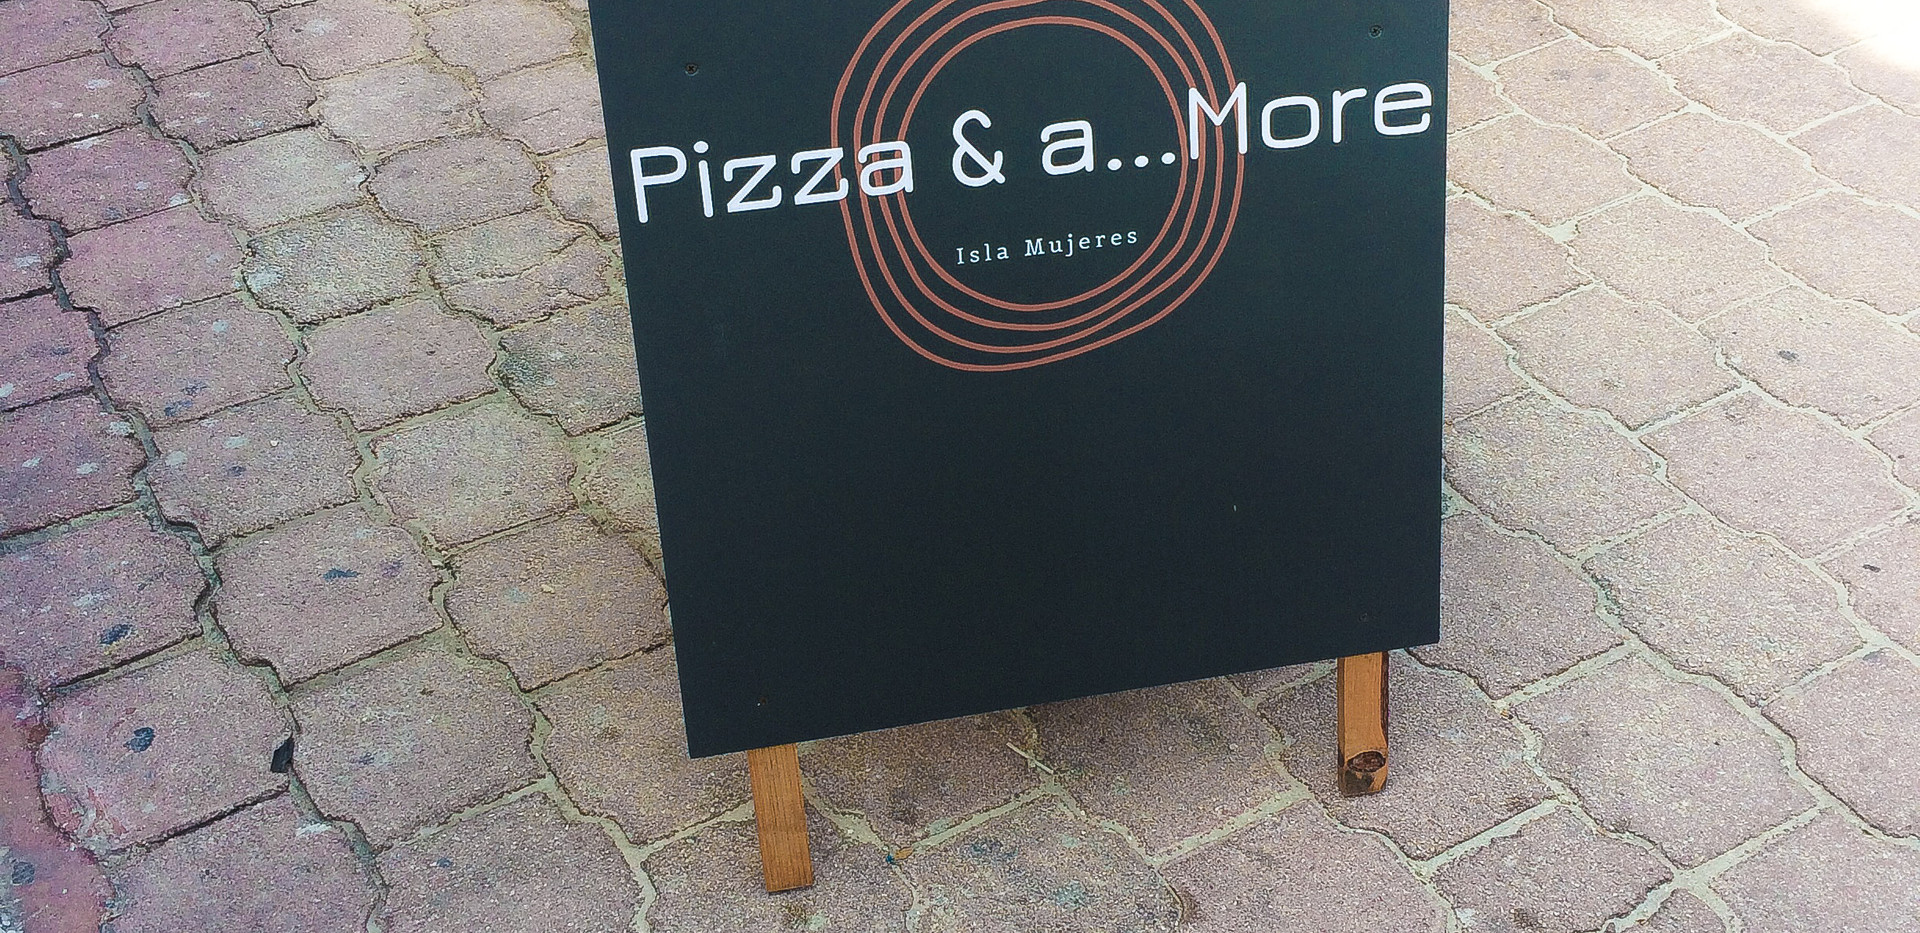 Pizza & a more   Isla Mujeres, Mexico   Taste of Isla